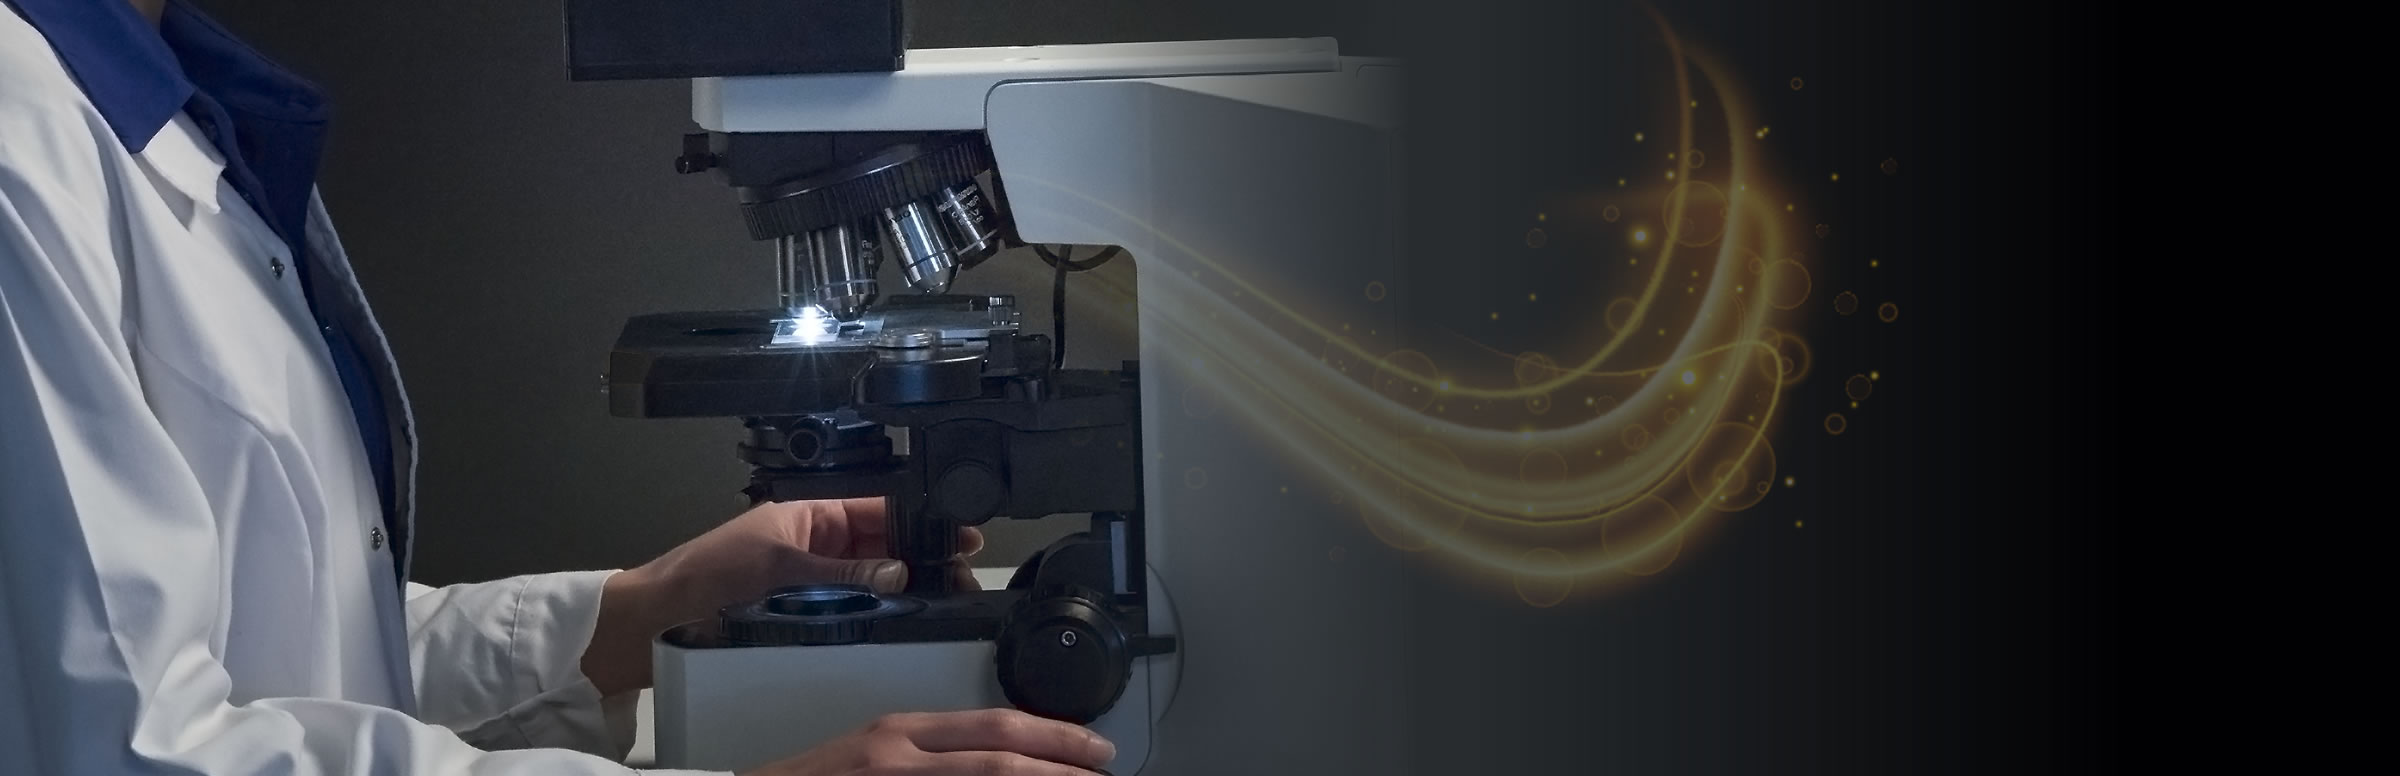 Microscope with magic